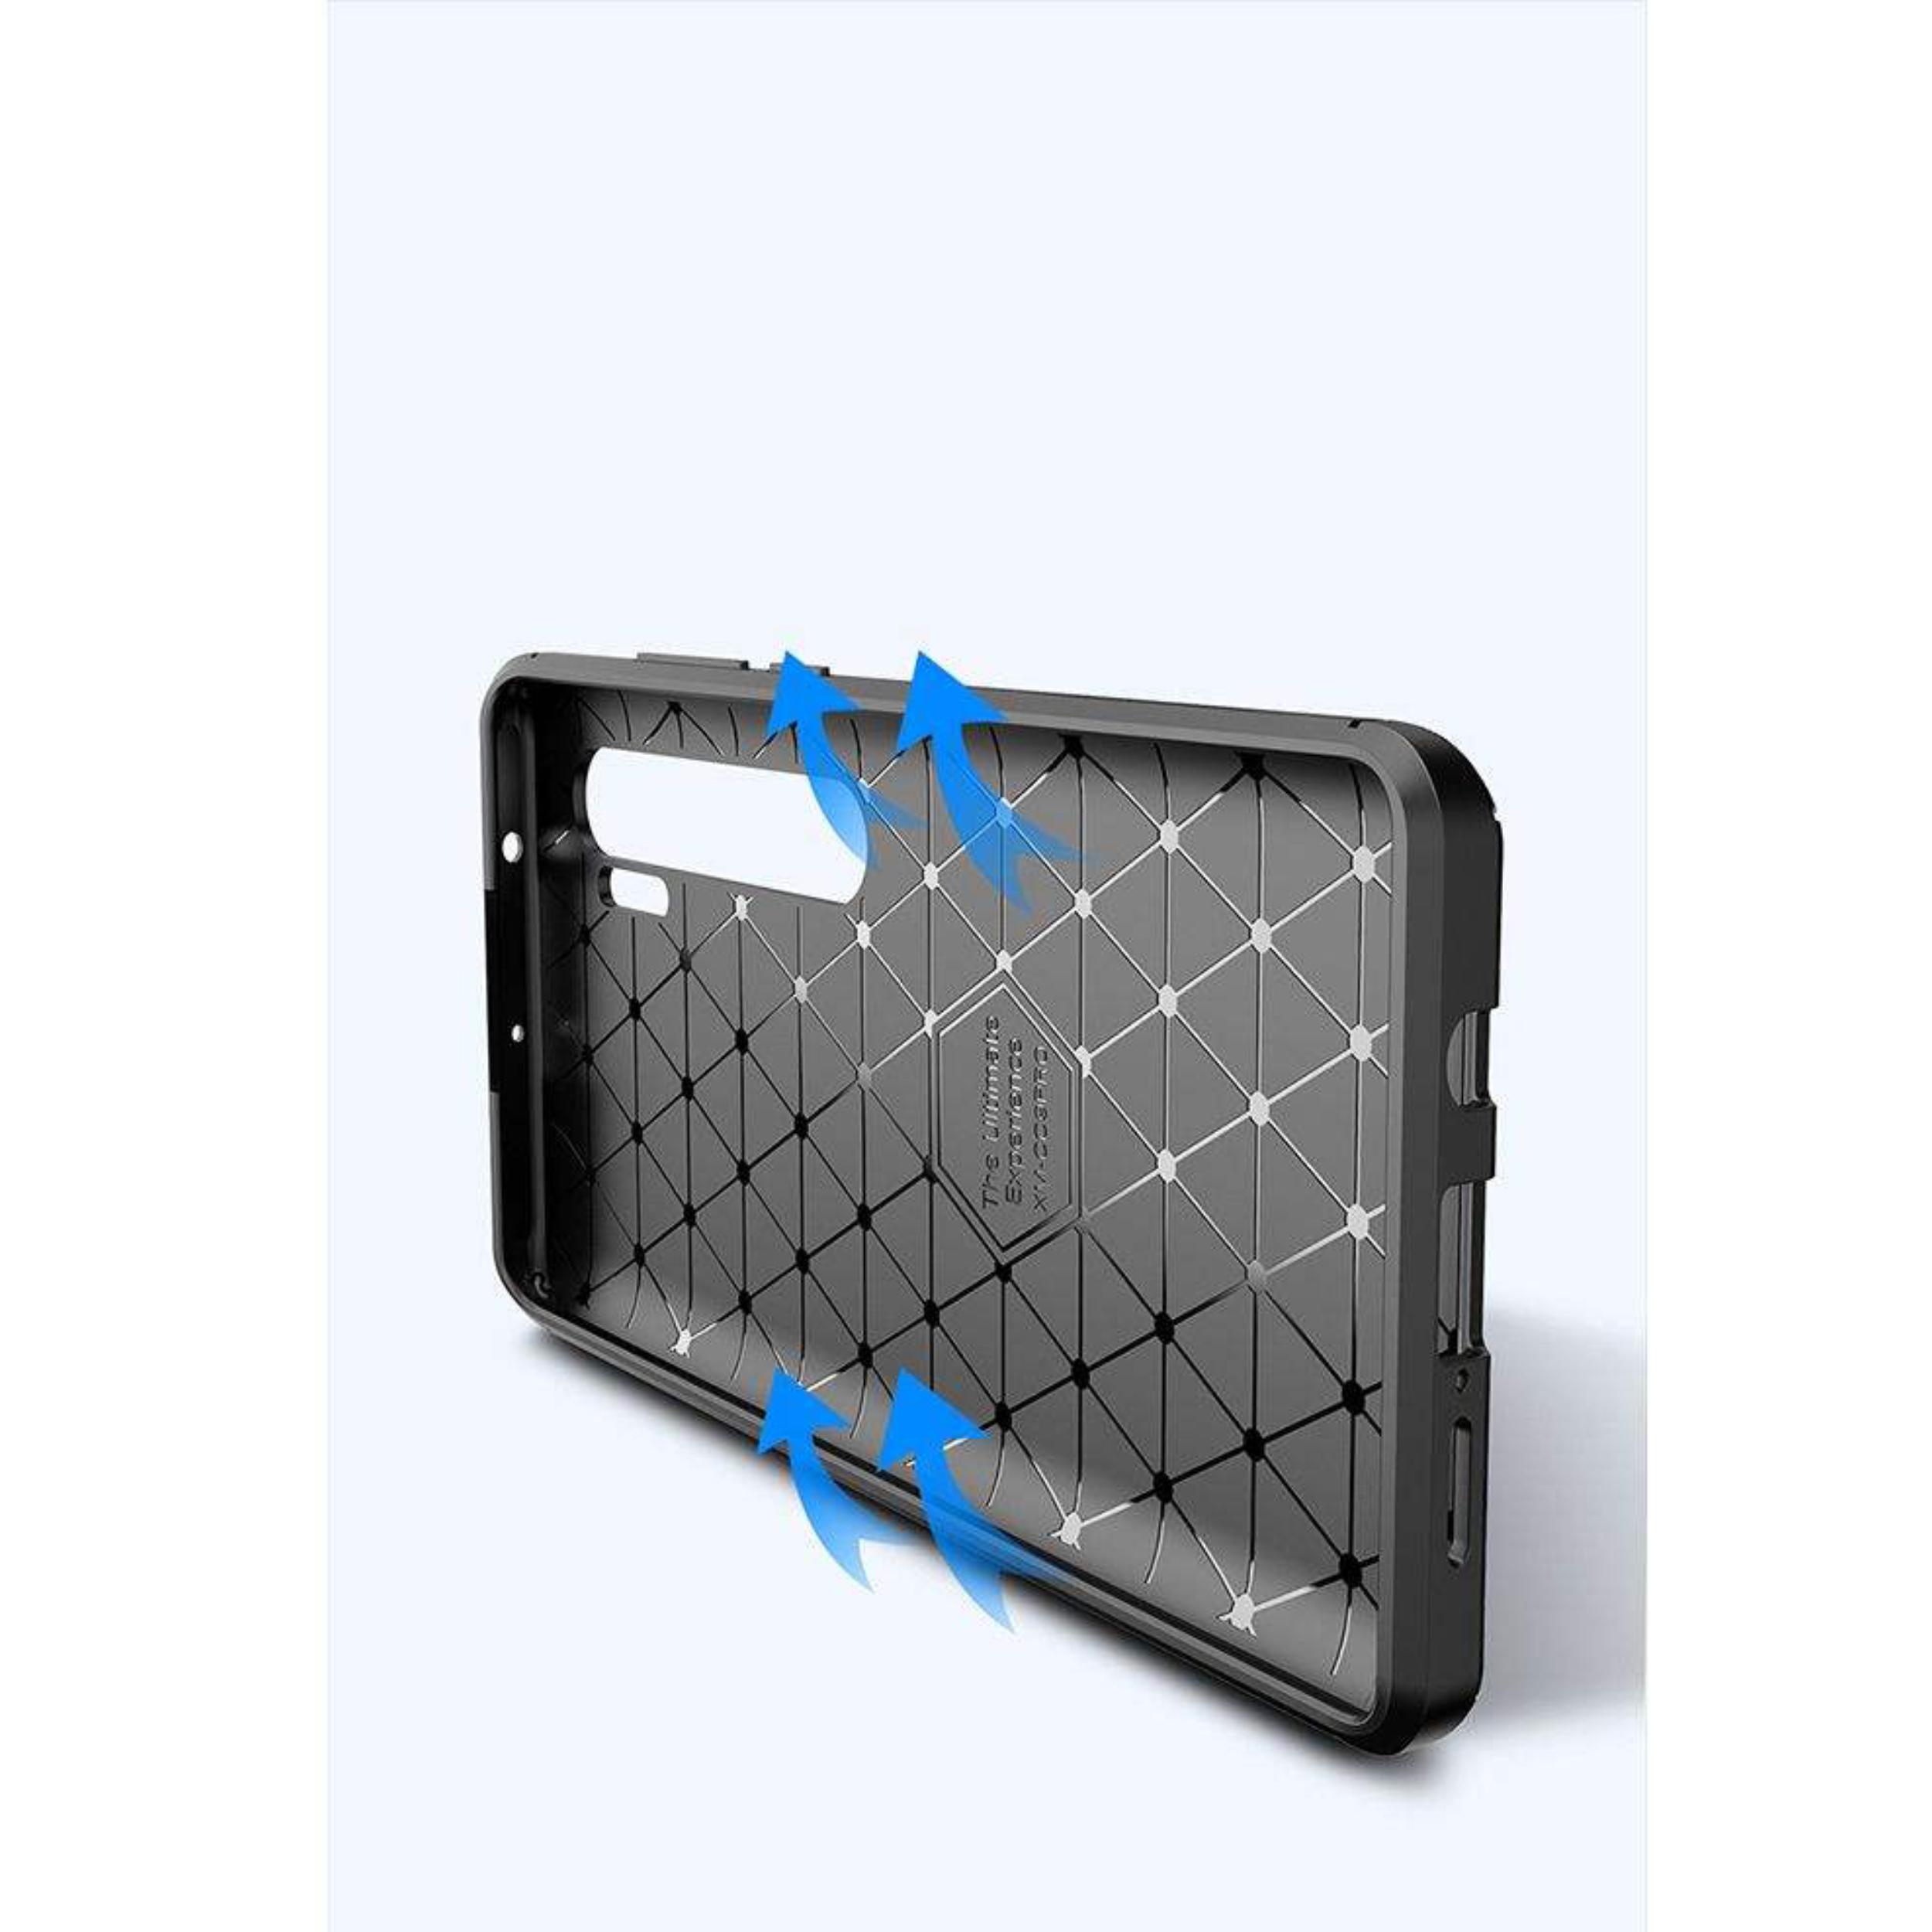 کاور لاین کینگ مدل A21 مناسب برای گوشی موبایل شیائومی Mi Note 10/Note 10 Pro/CC9 Pro thumb 2 9